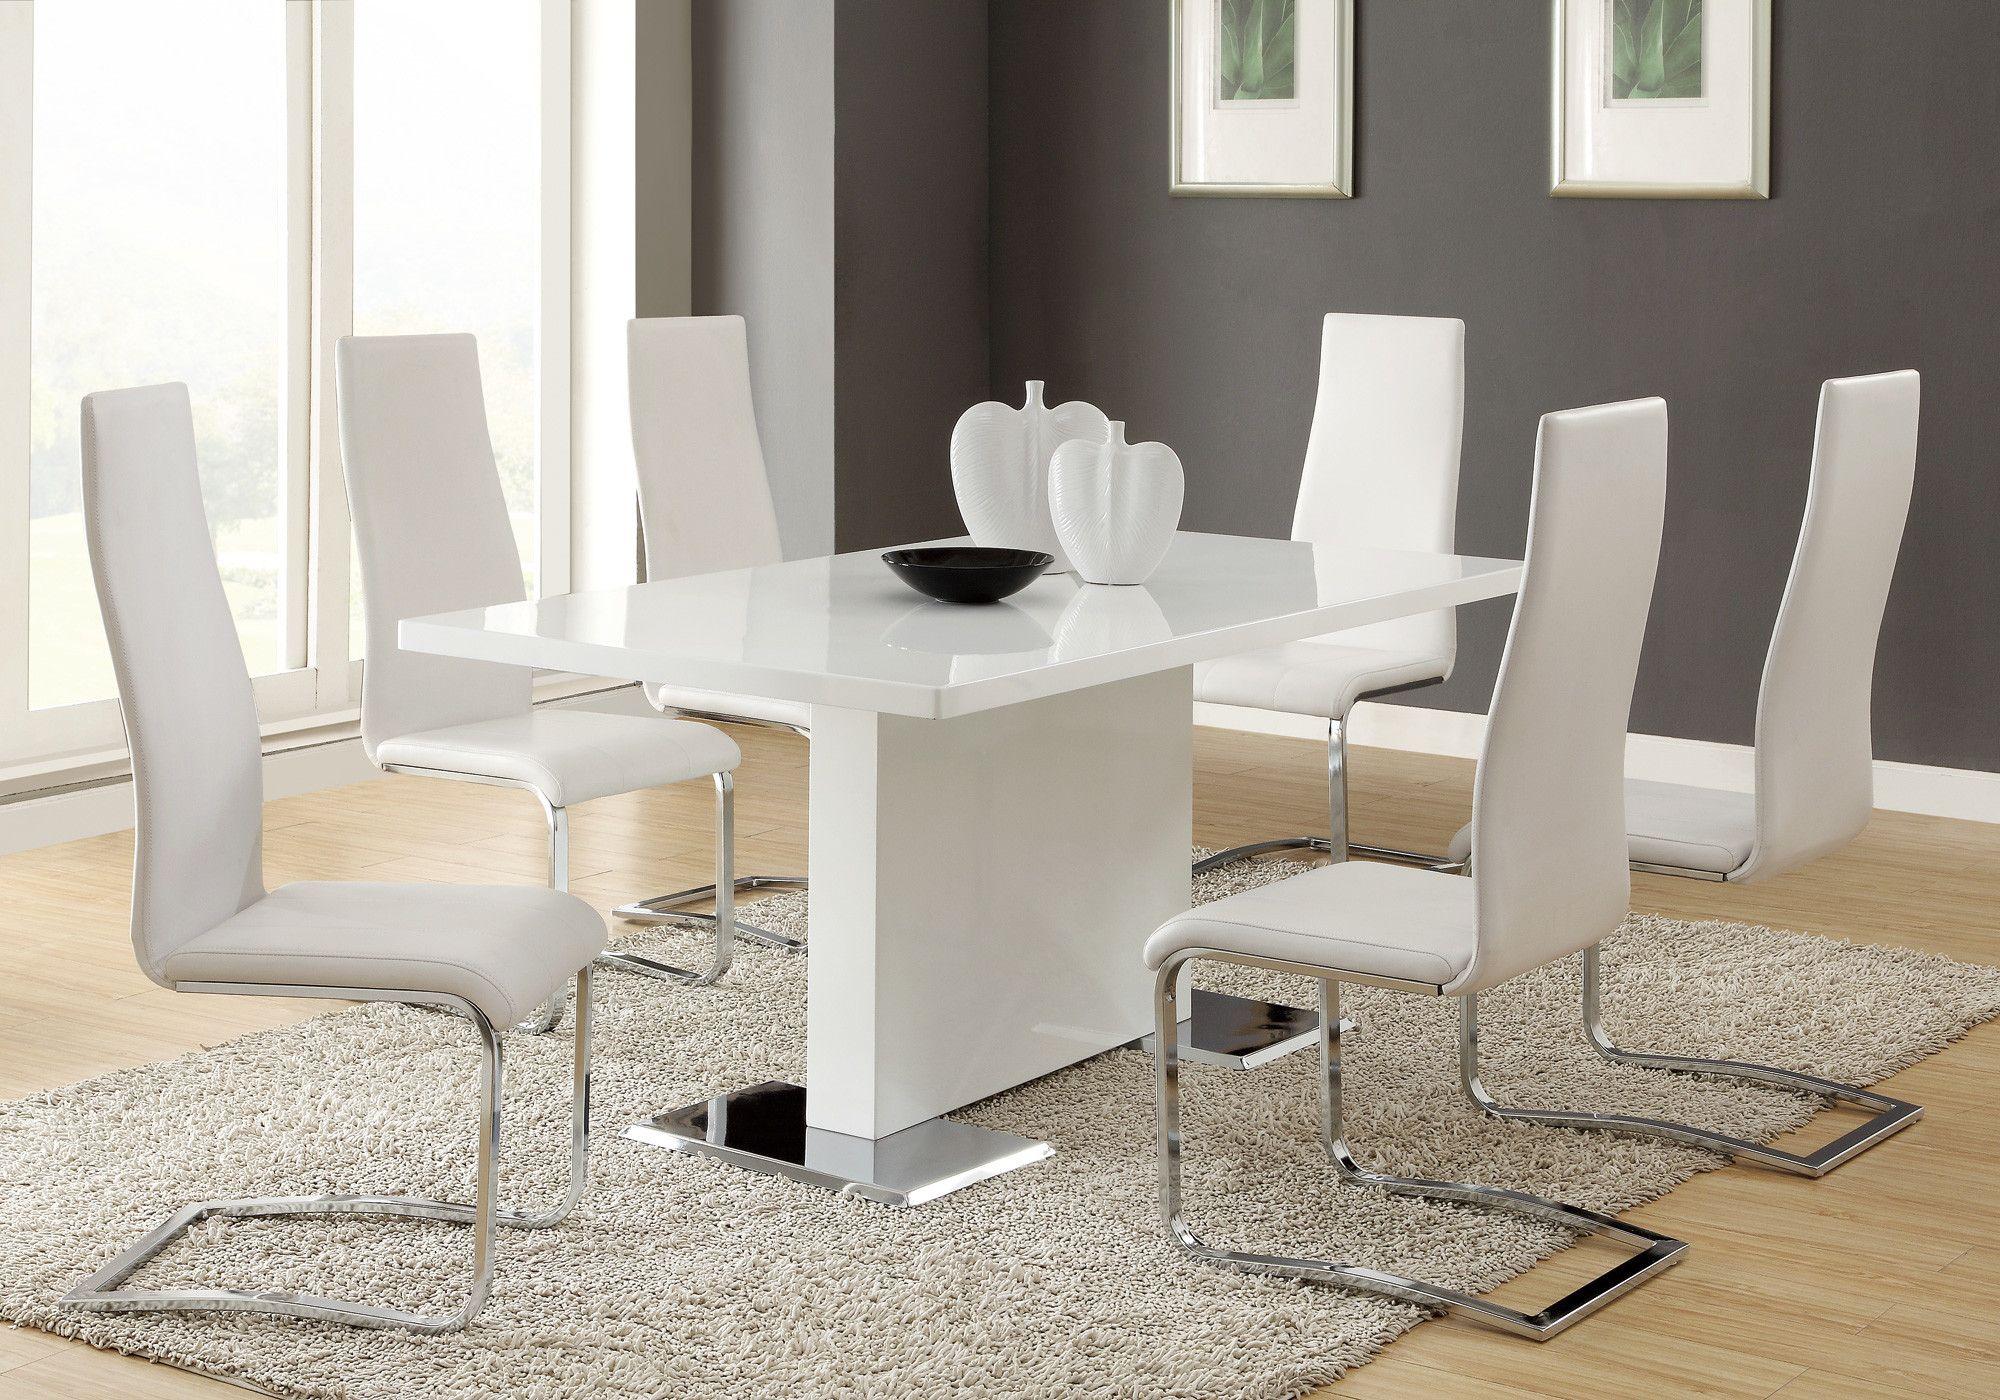 Wildon Home 9 Piece Dining Set Wayfair 1 Table 8 Chairs 1305 33 Modern Dining Room Set Modern Dining Table Set Contemporary Dining Room Sets